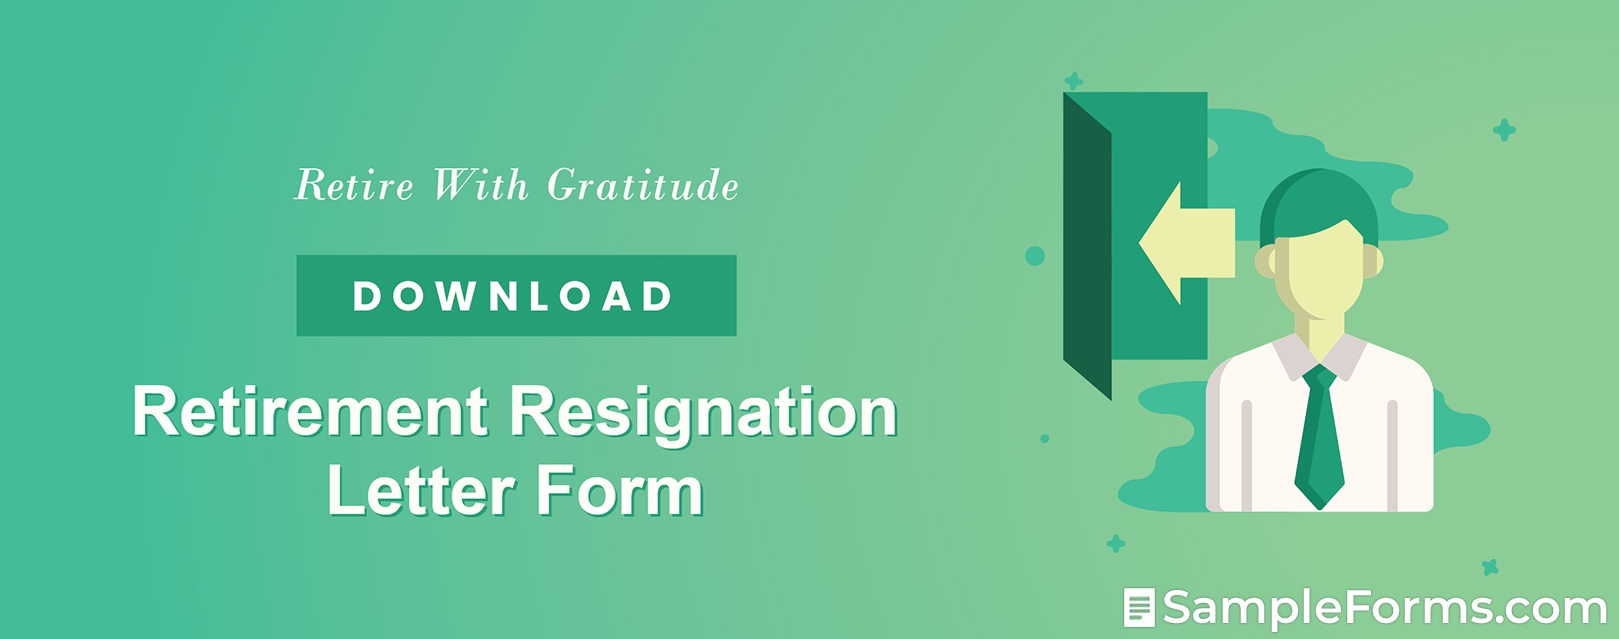 Retirement Resignation Letter Form1